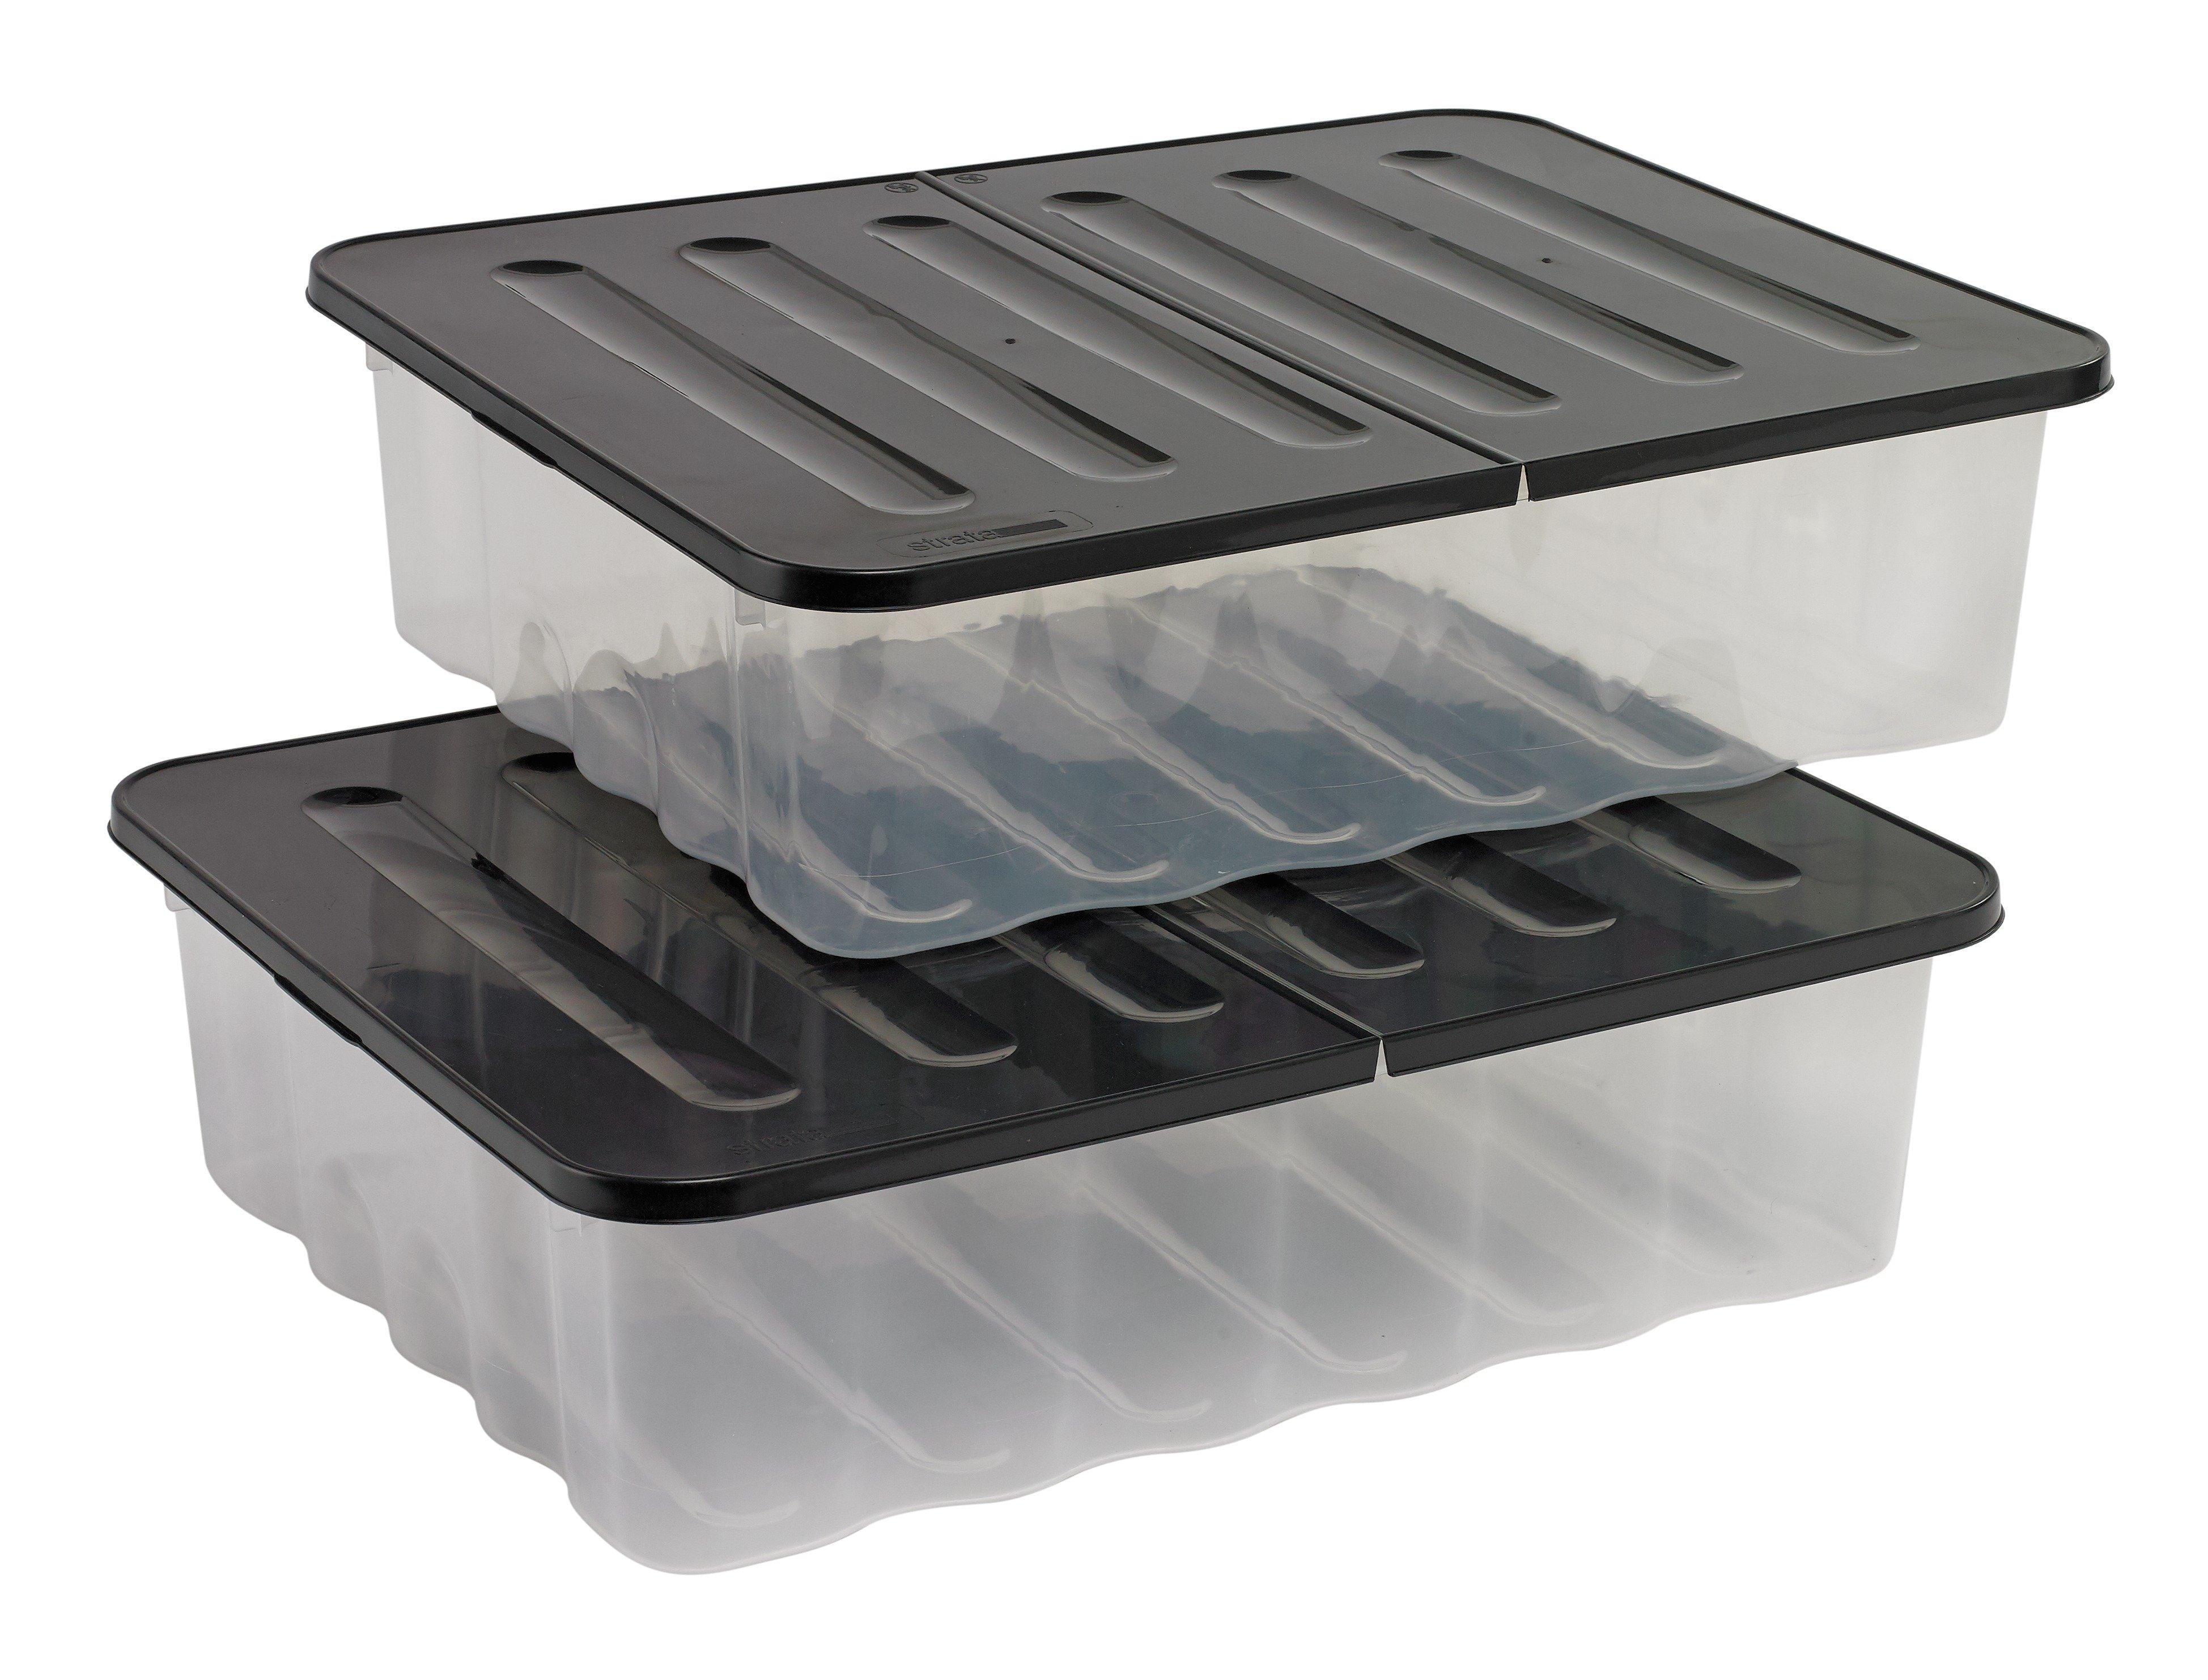 home supa nova 30 litre underbed storage boxes set of 2